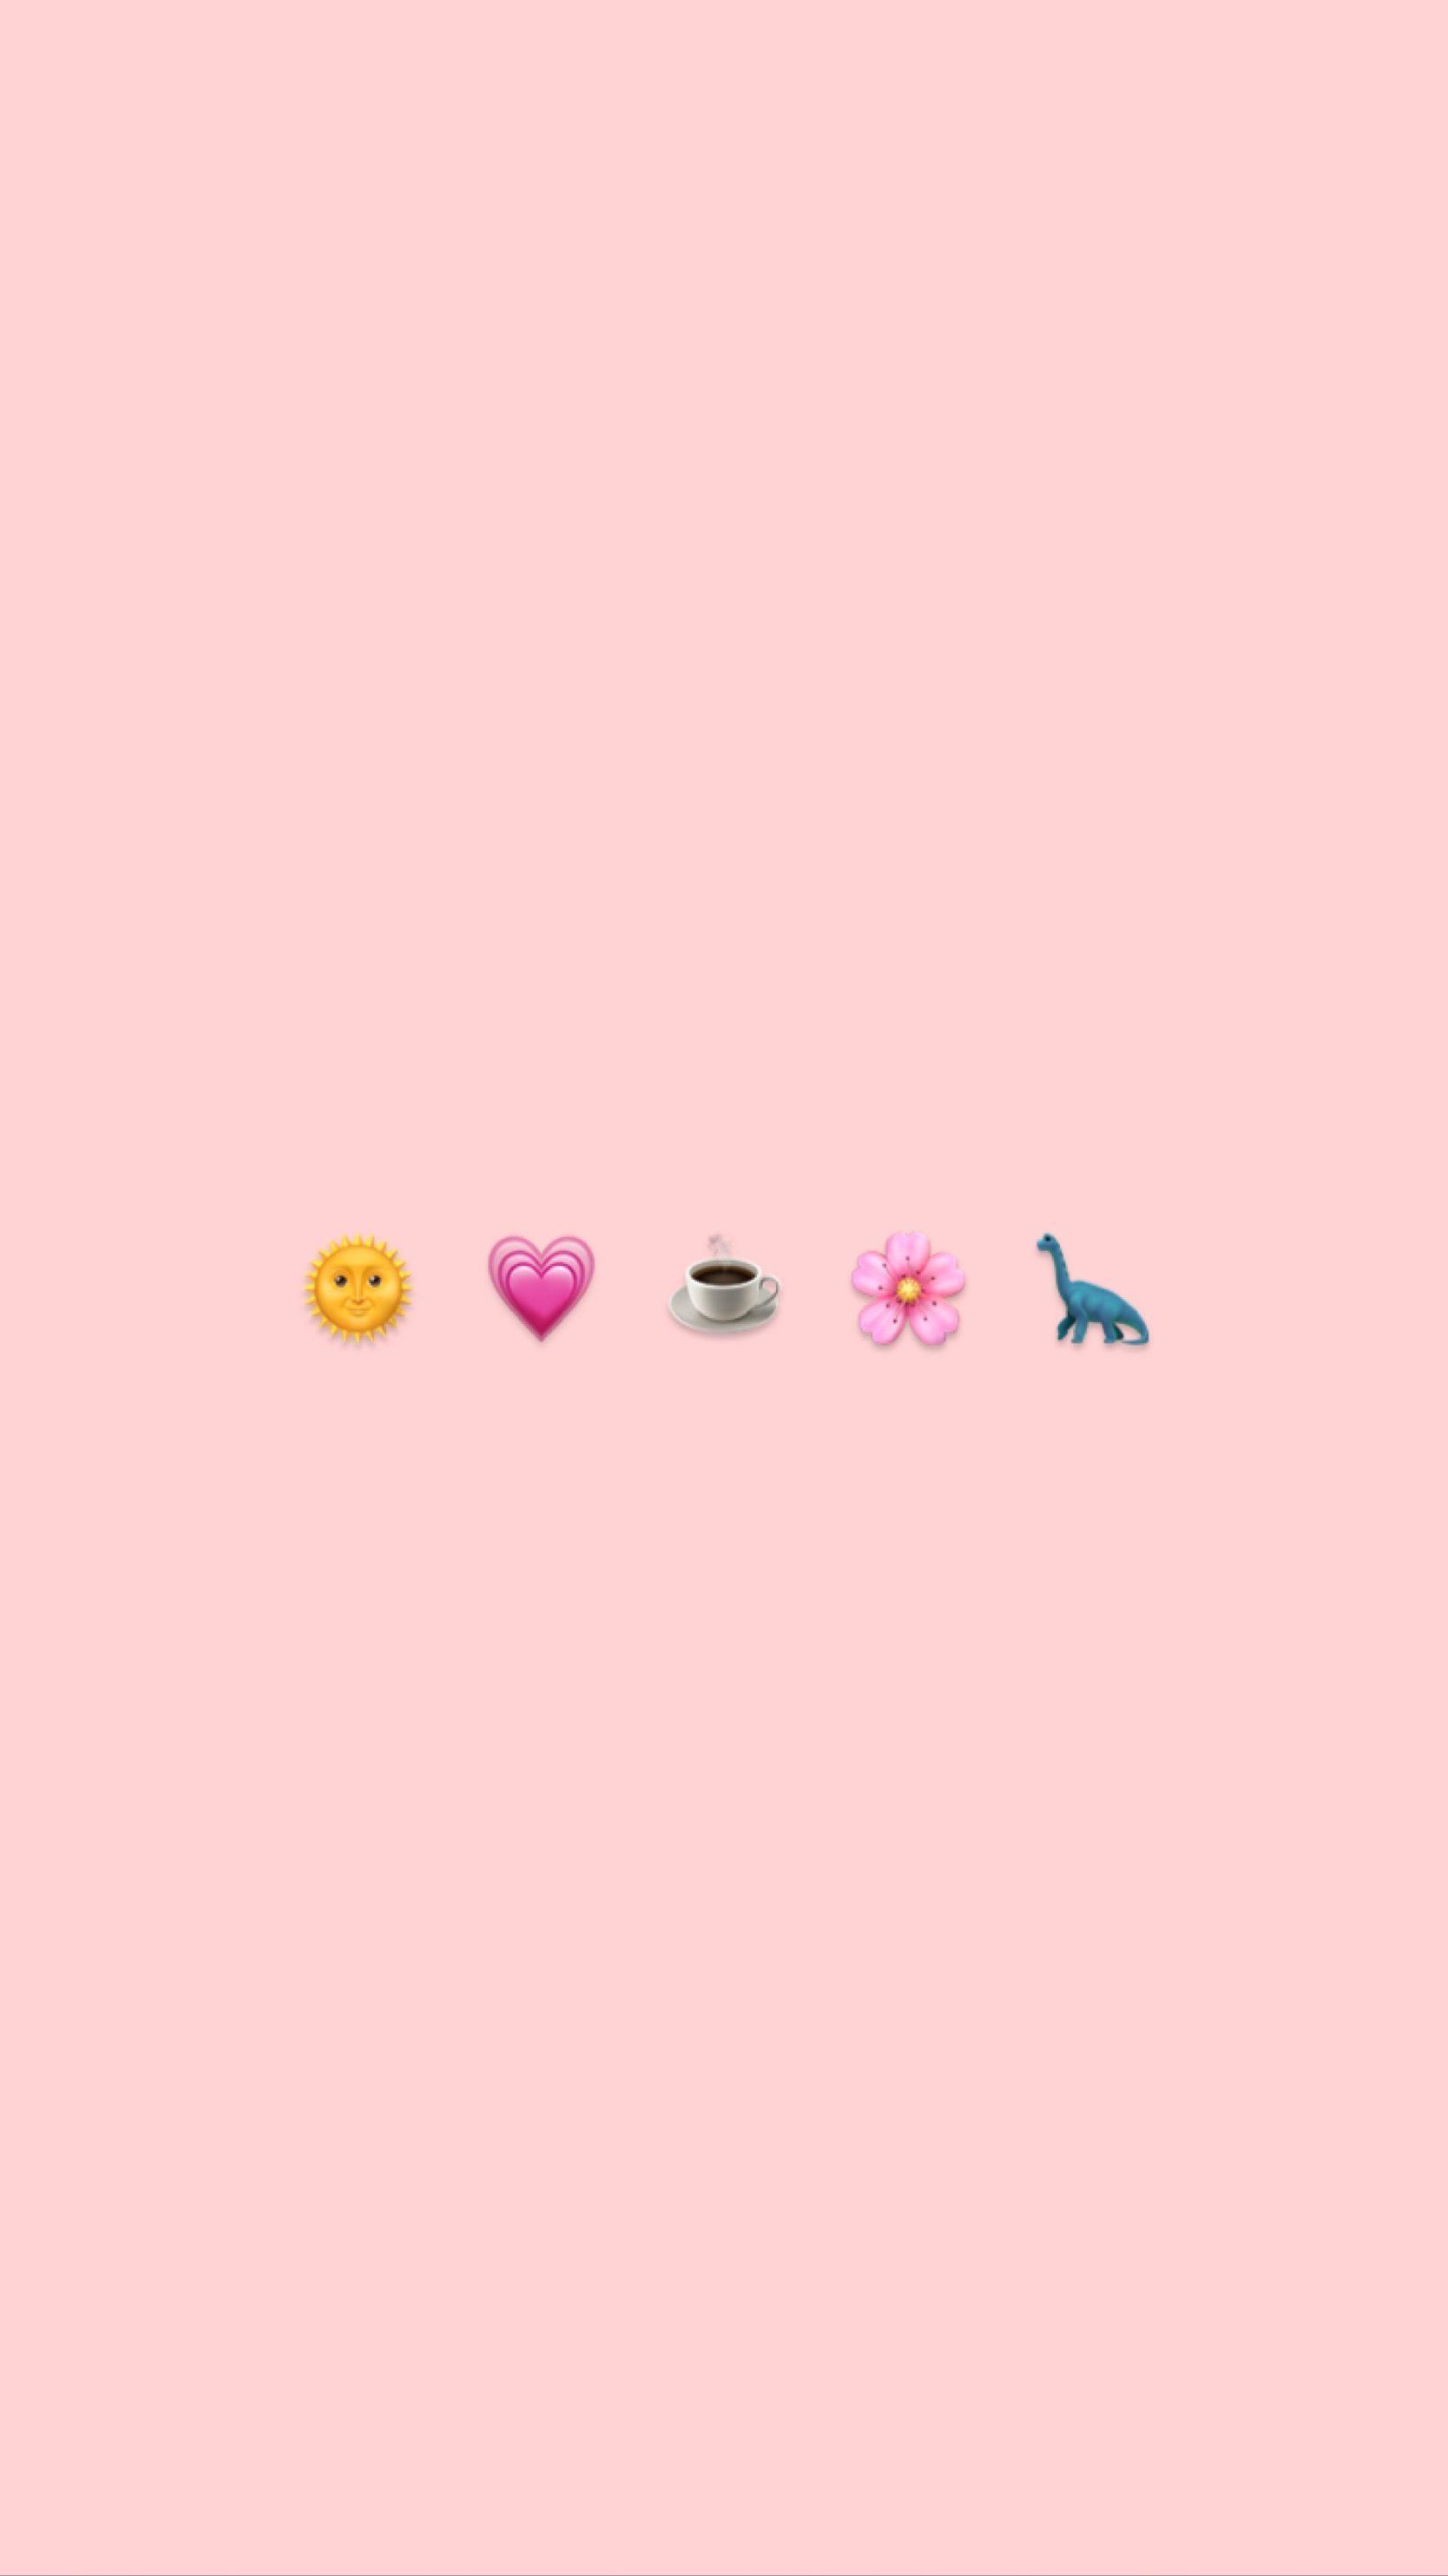 Aesthetic Emoji Wallpapers Top Free Aesthetic Emoji Backgrounds Wallpaperaccess